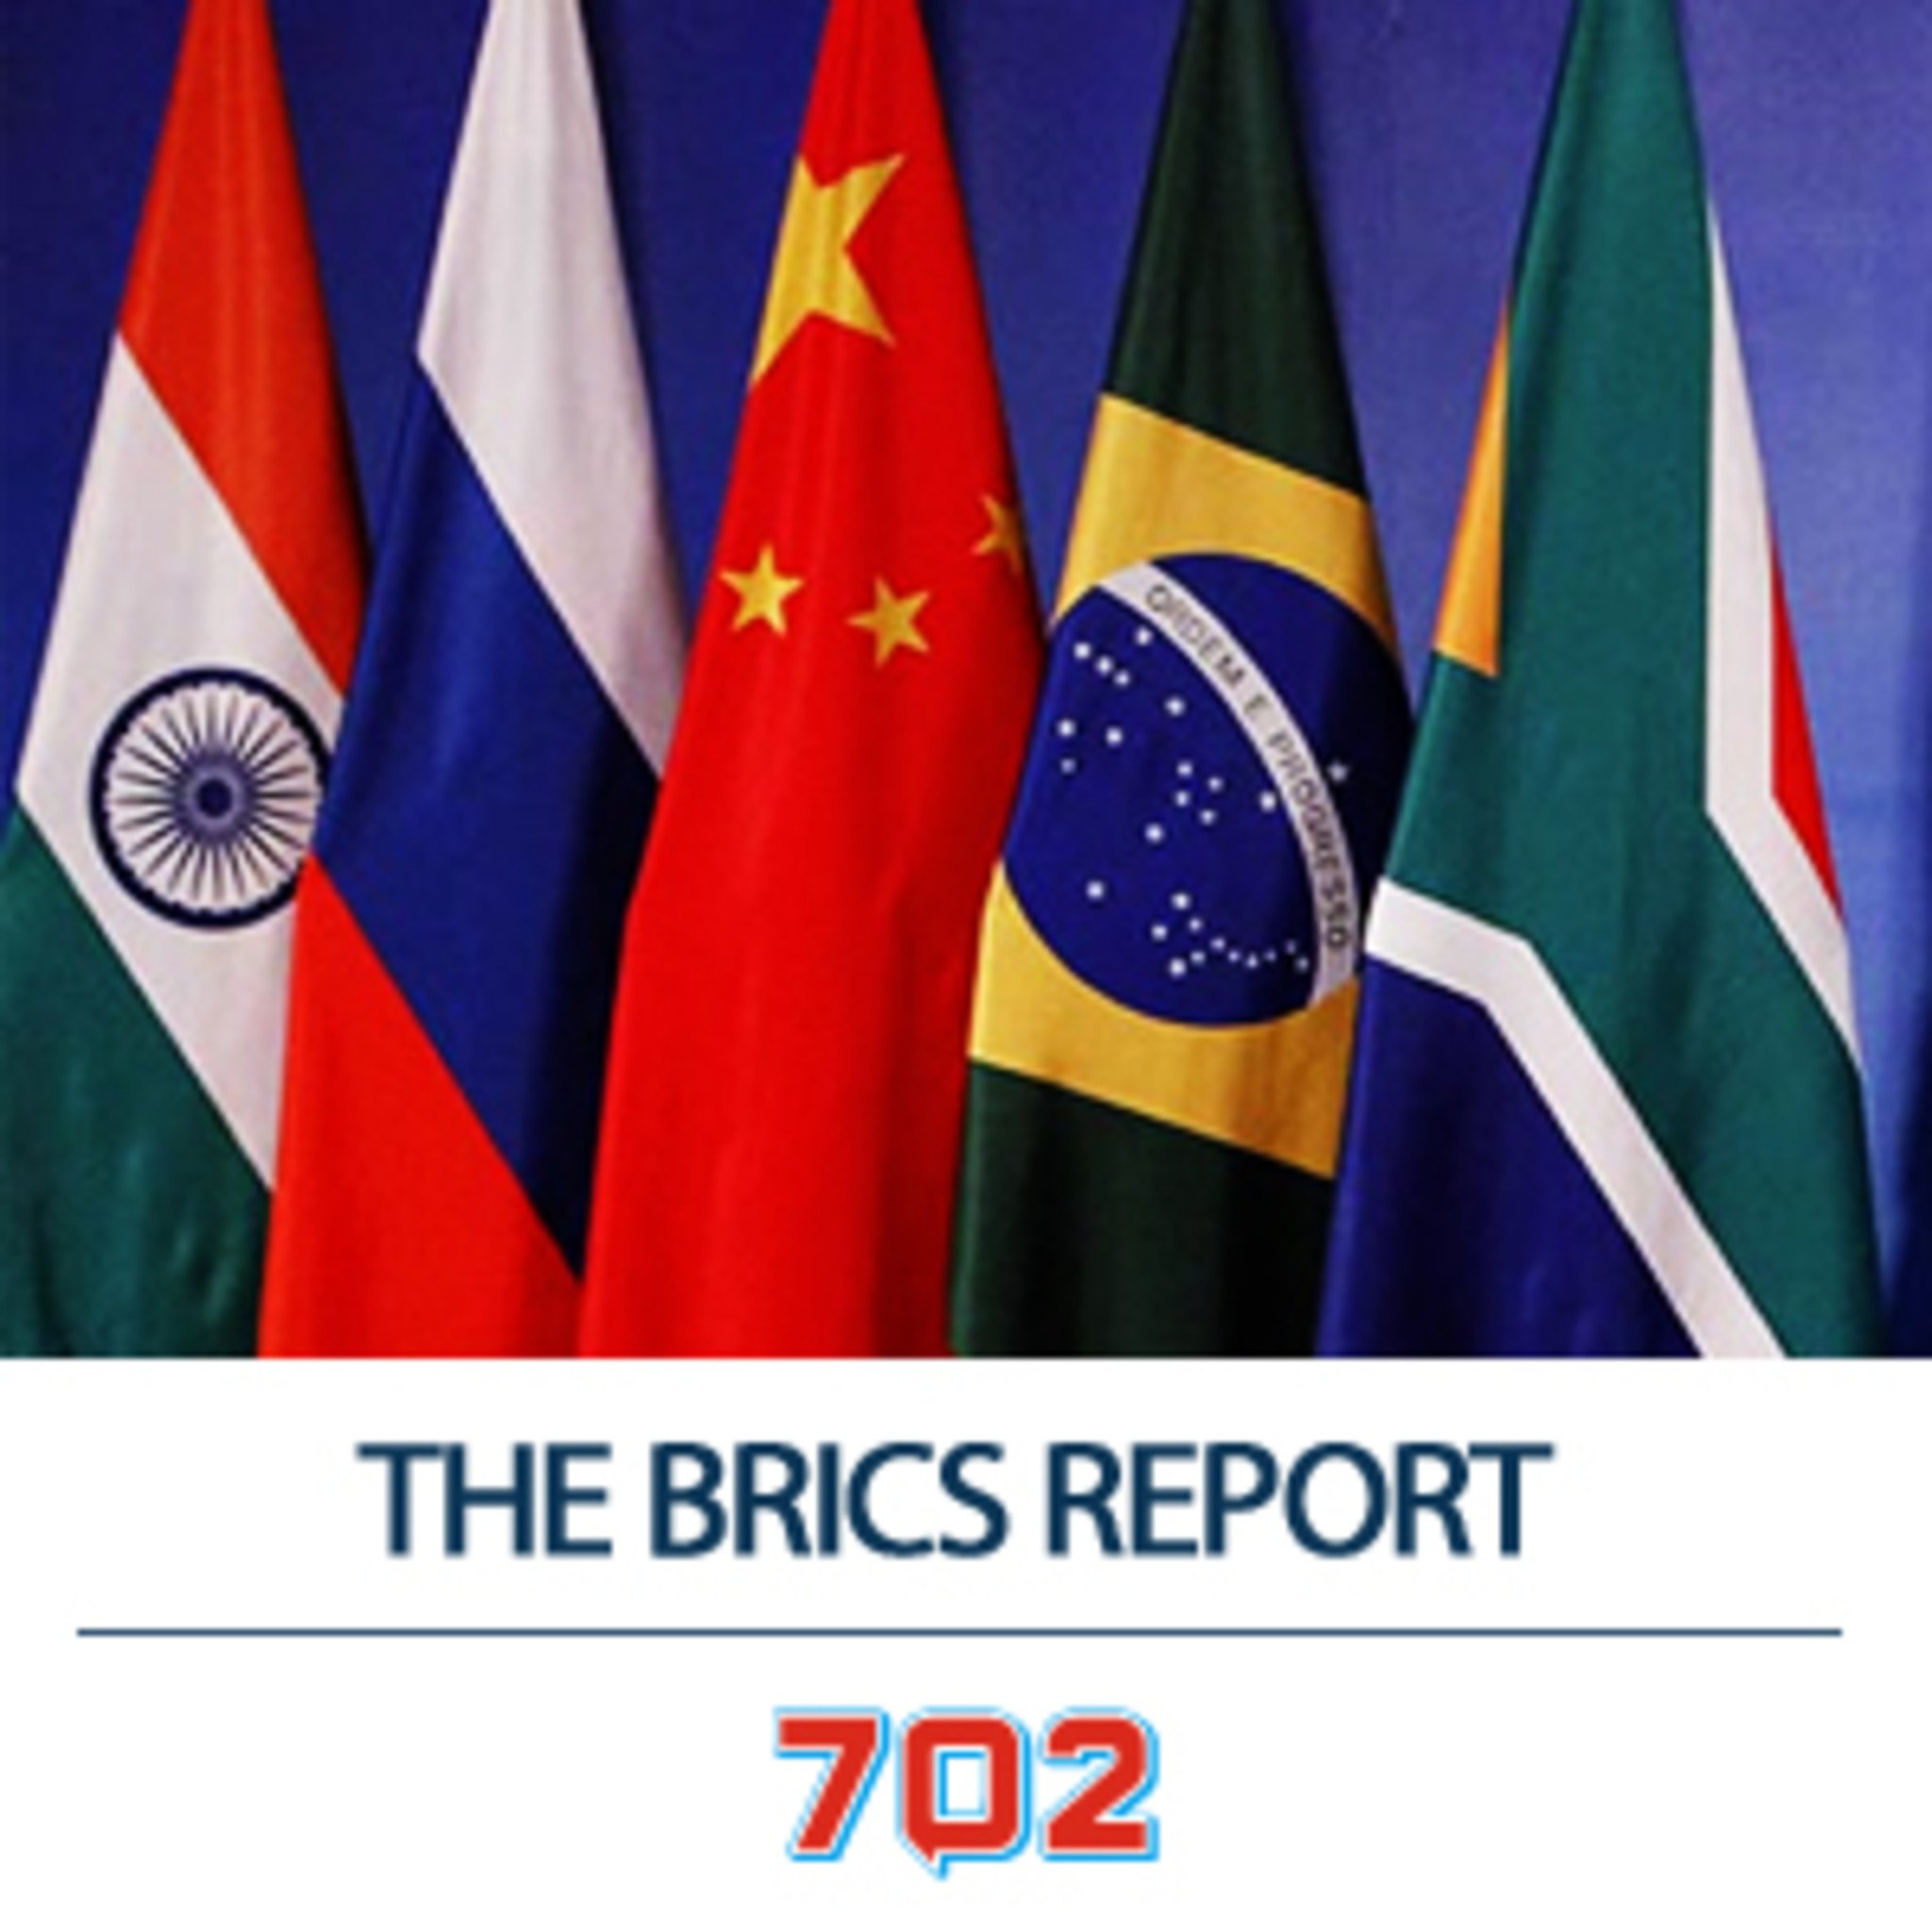 BRICS Report: Russia